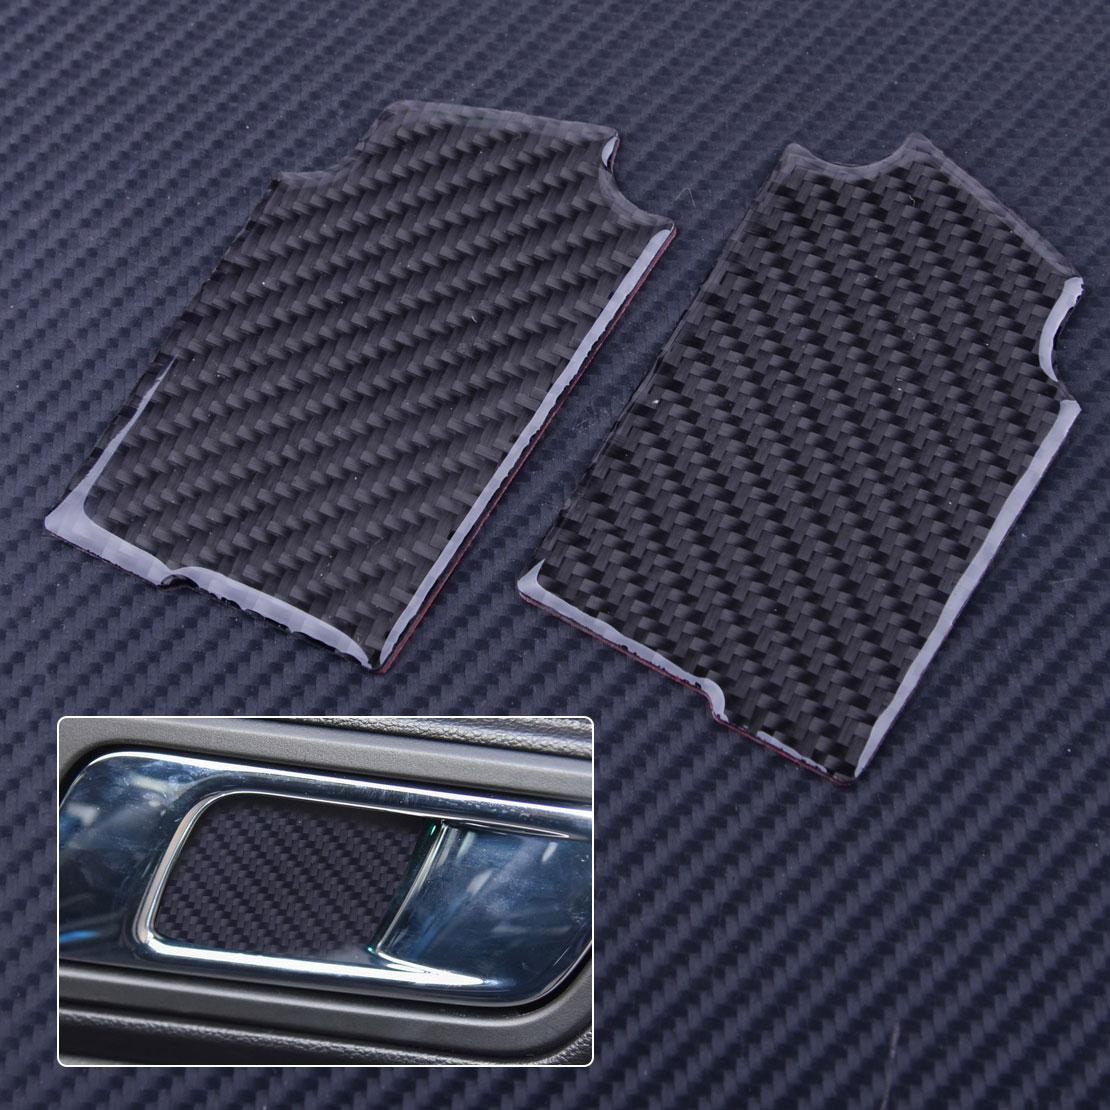 2 uds, manija de puerta interior de fibra de carbono negra para coche, tapa de Panel de parche, pegatina decorativa para Ford Mustang 2015 2016 2017